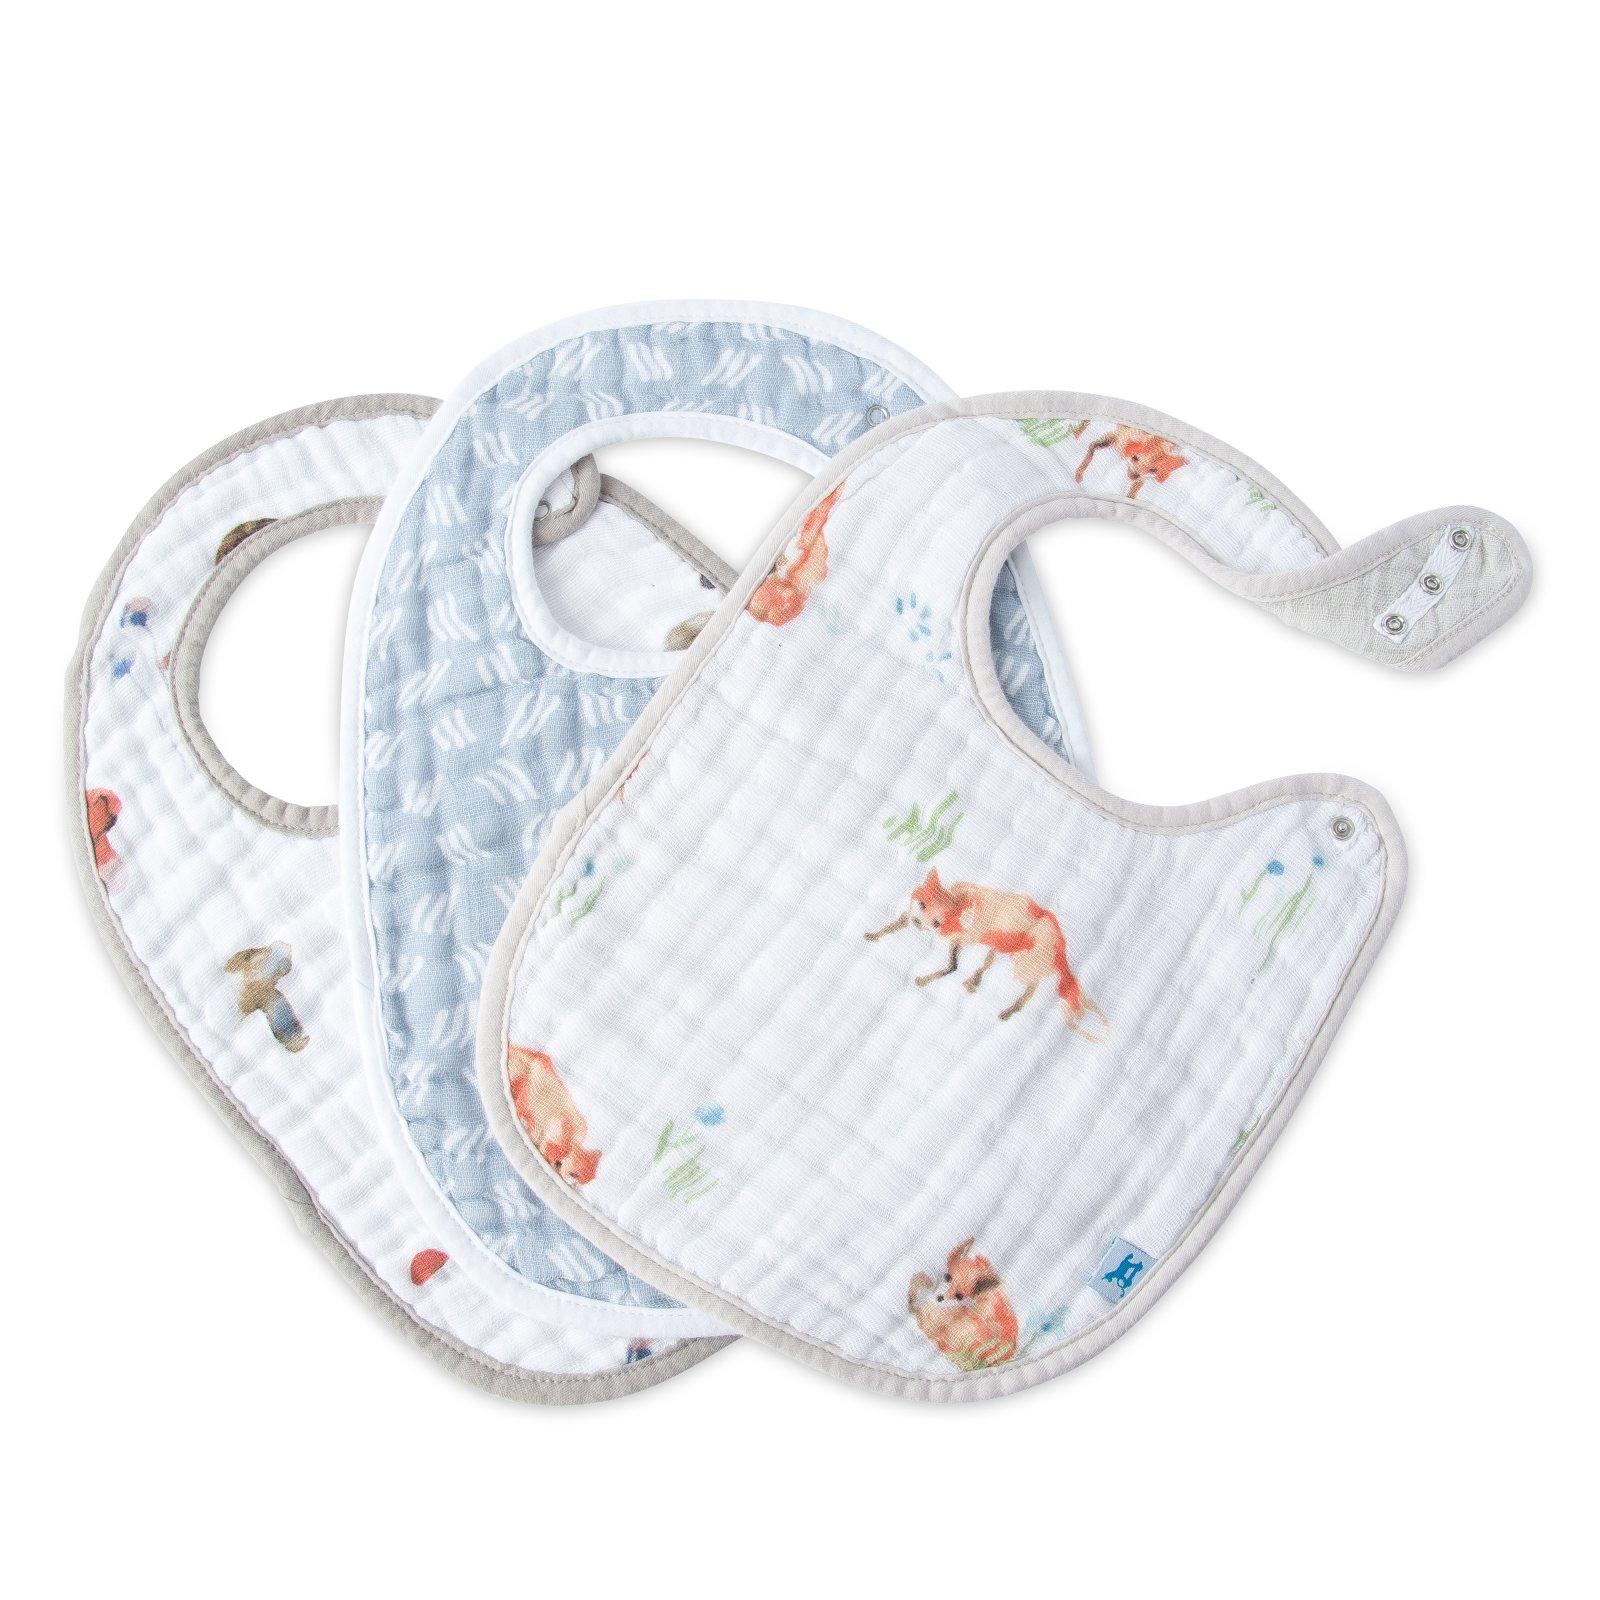 Little Unicorn Cotton Muslin Classic Bib 3 Pack - Fox